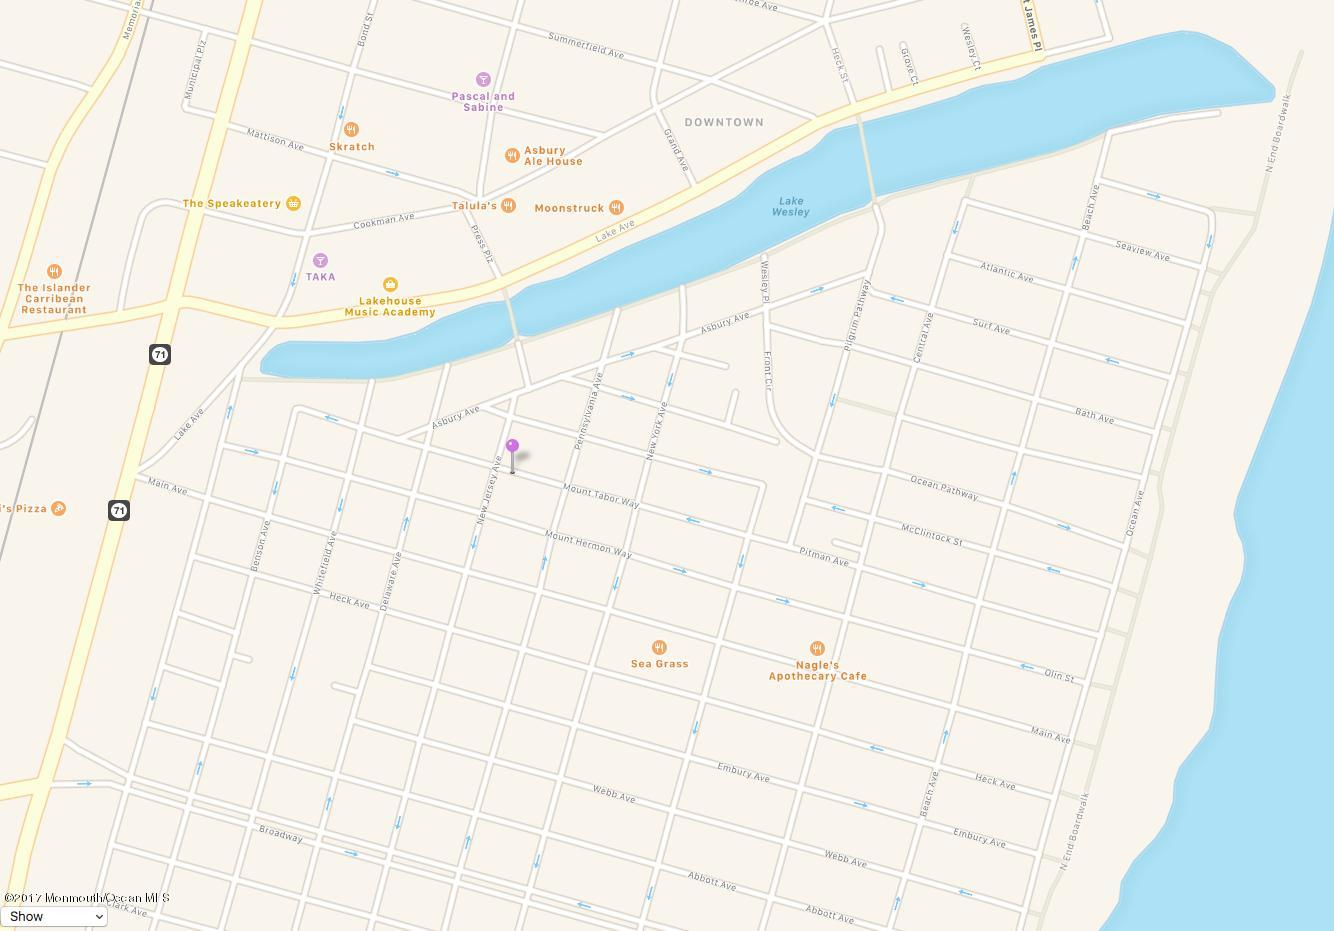 100 Mount Tabor Way, Ocean Grove, 07756 - SOLD LISTING, MLS # 21902618 |  Crossroads Realty